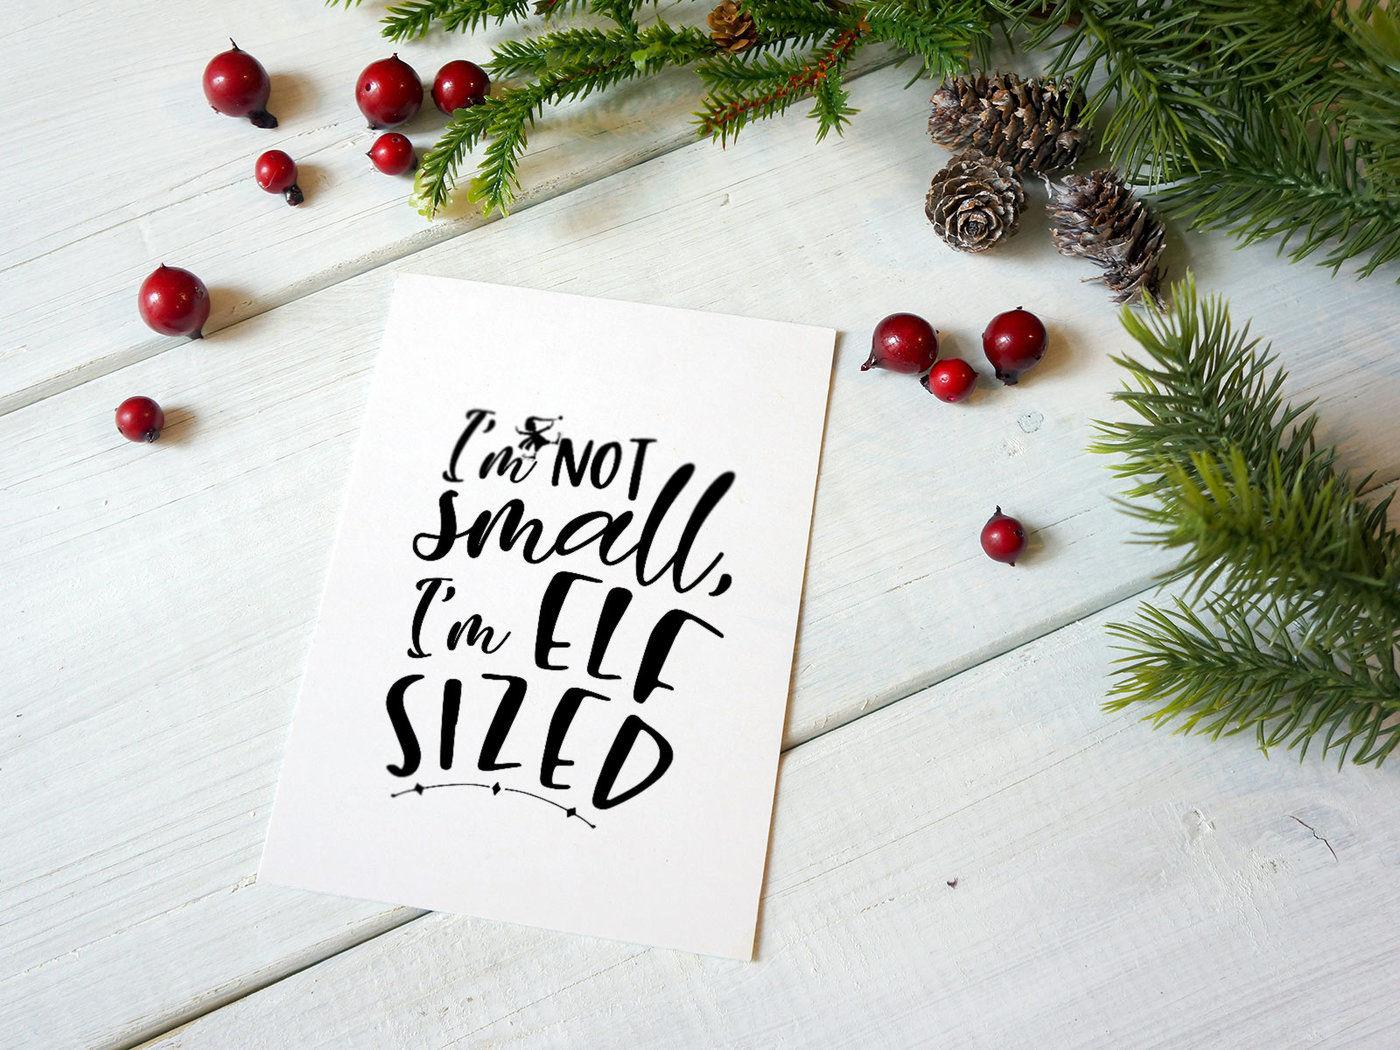 Funny Christmas Quotes Svg Cut File Bundle Deal By Mecstudio